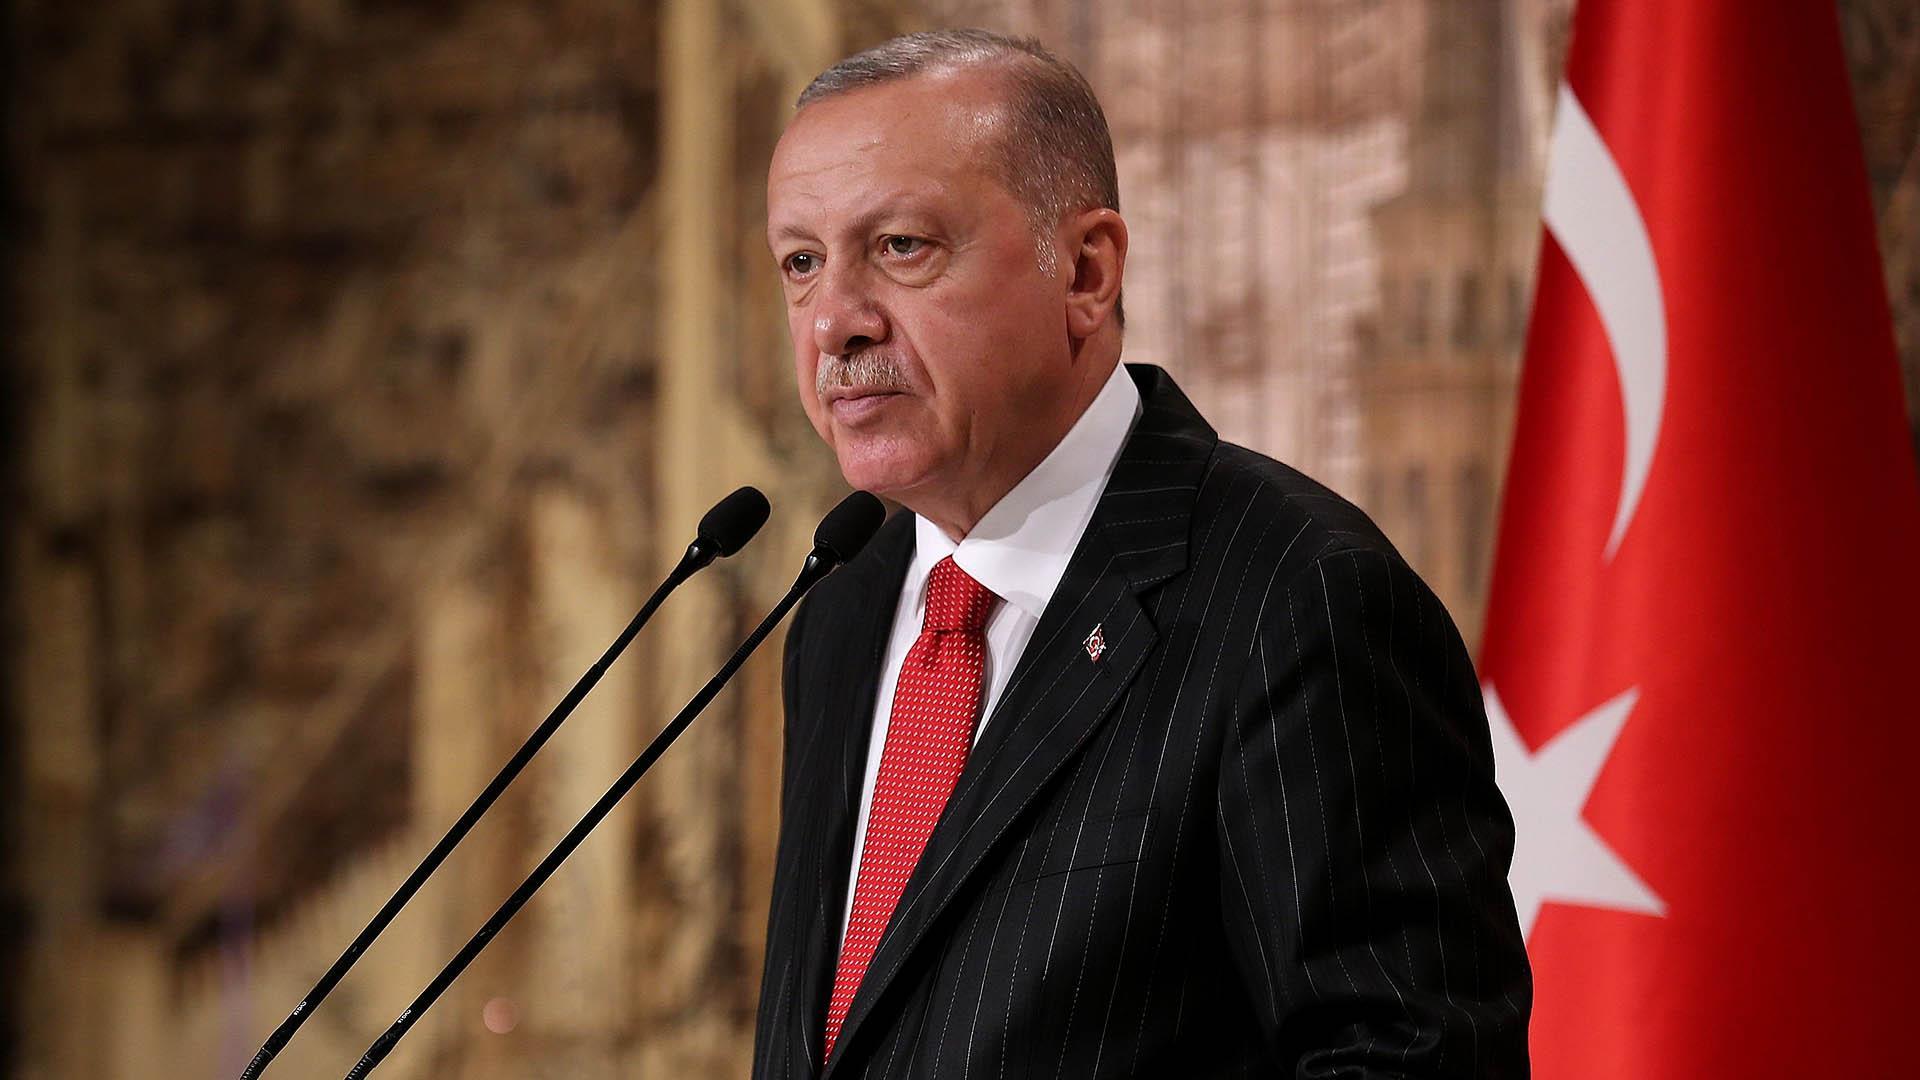 Turkey's Erdogan says he won't forget undiplomatic Trump letter, warns U.S. must keep Syria promises